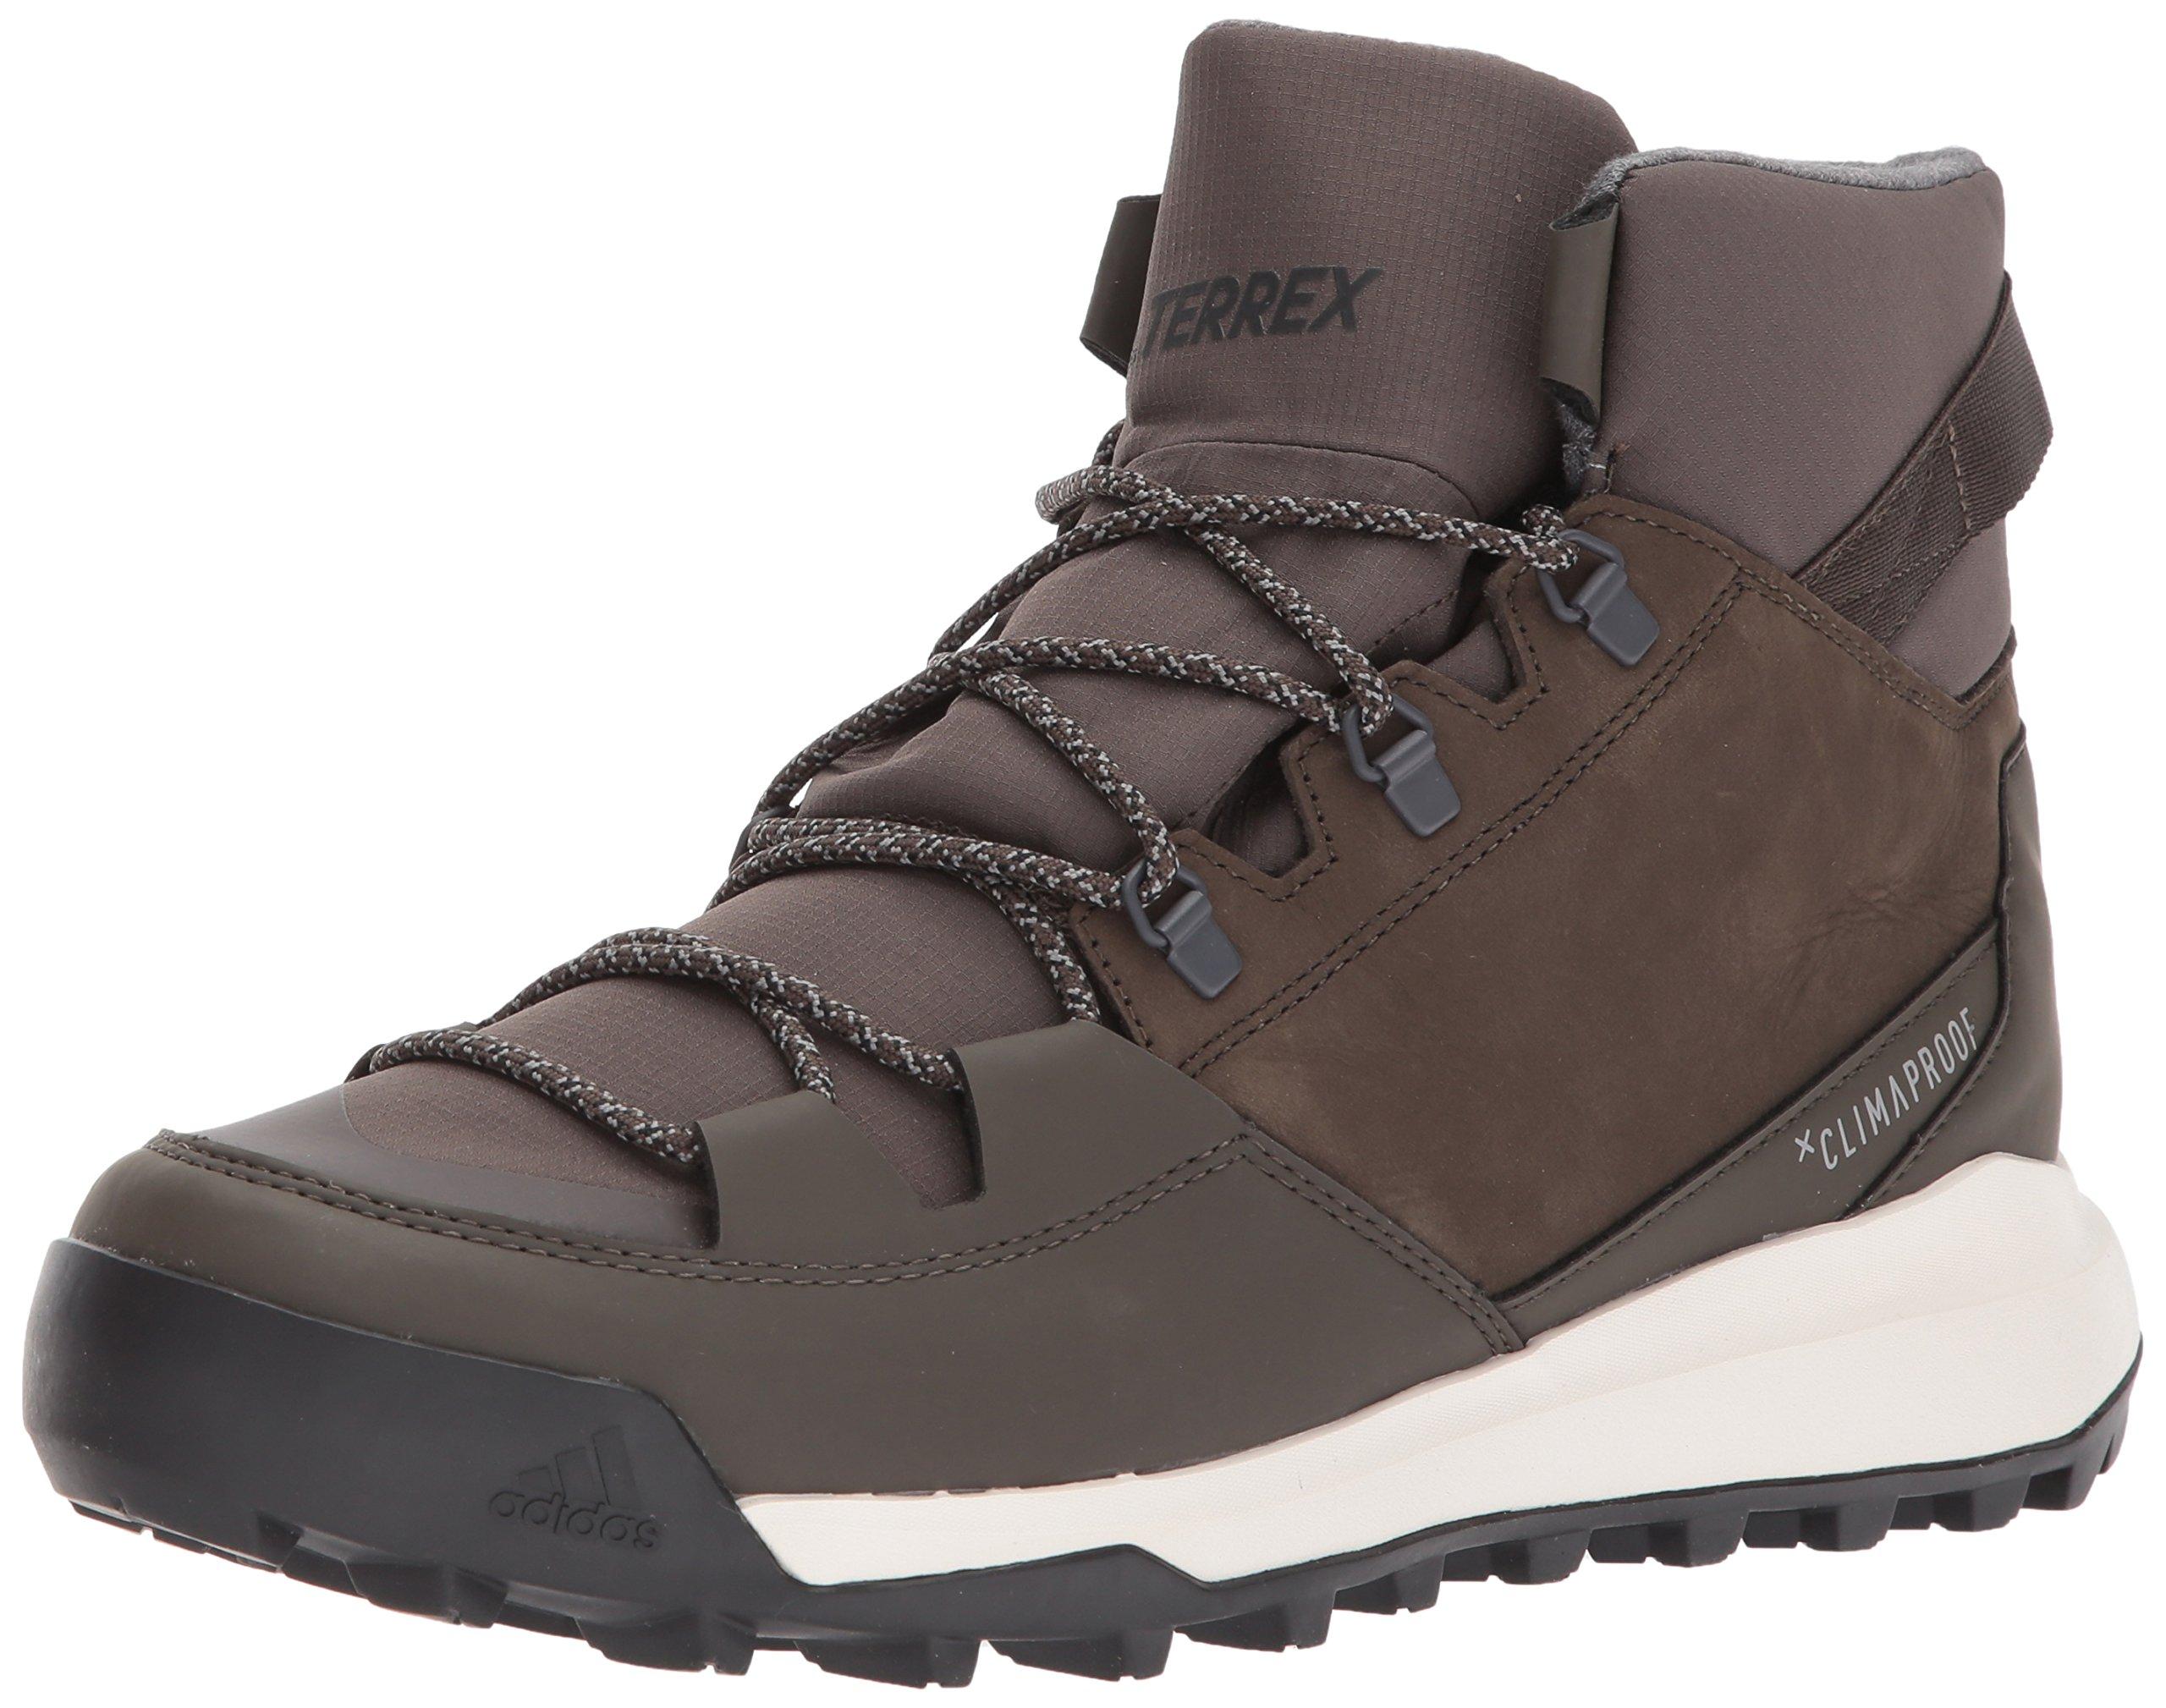 adidas Outdoor Men's Terrex Winterpitch CW CP Walking-Shoes, Umber/Black/Simple Brown, 11 D US